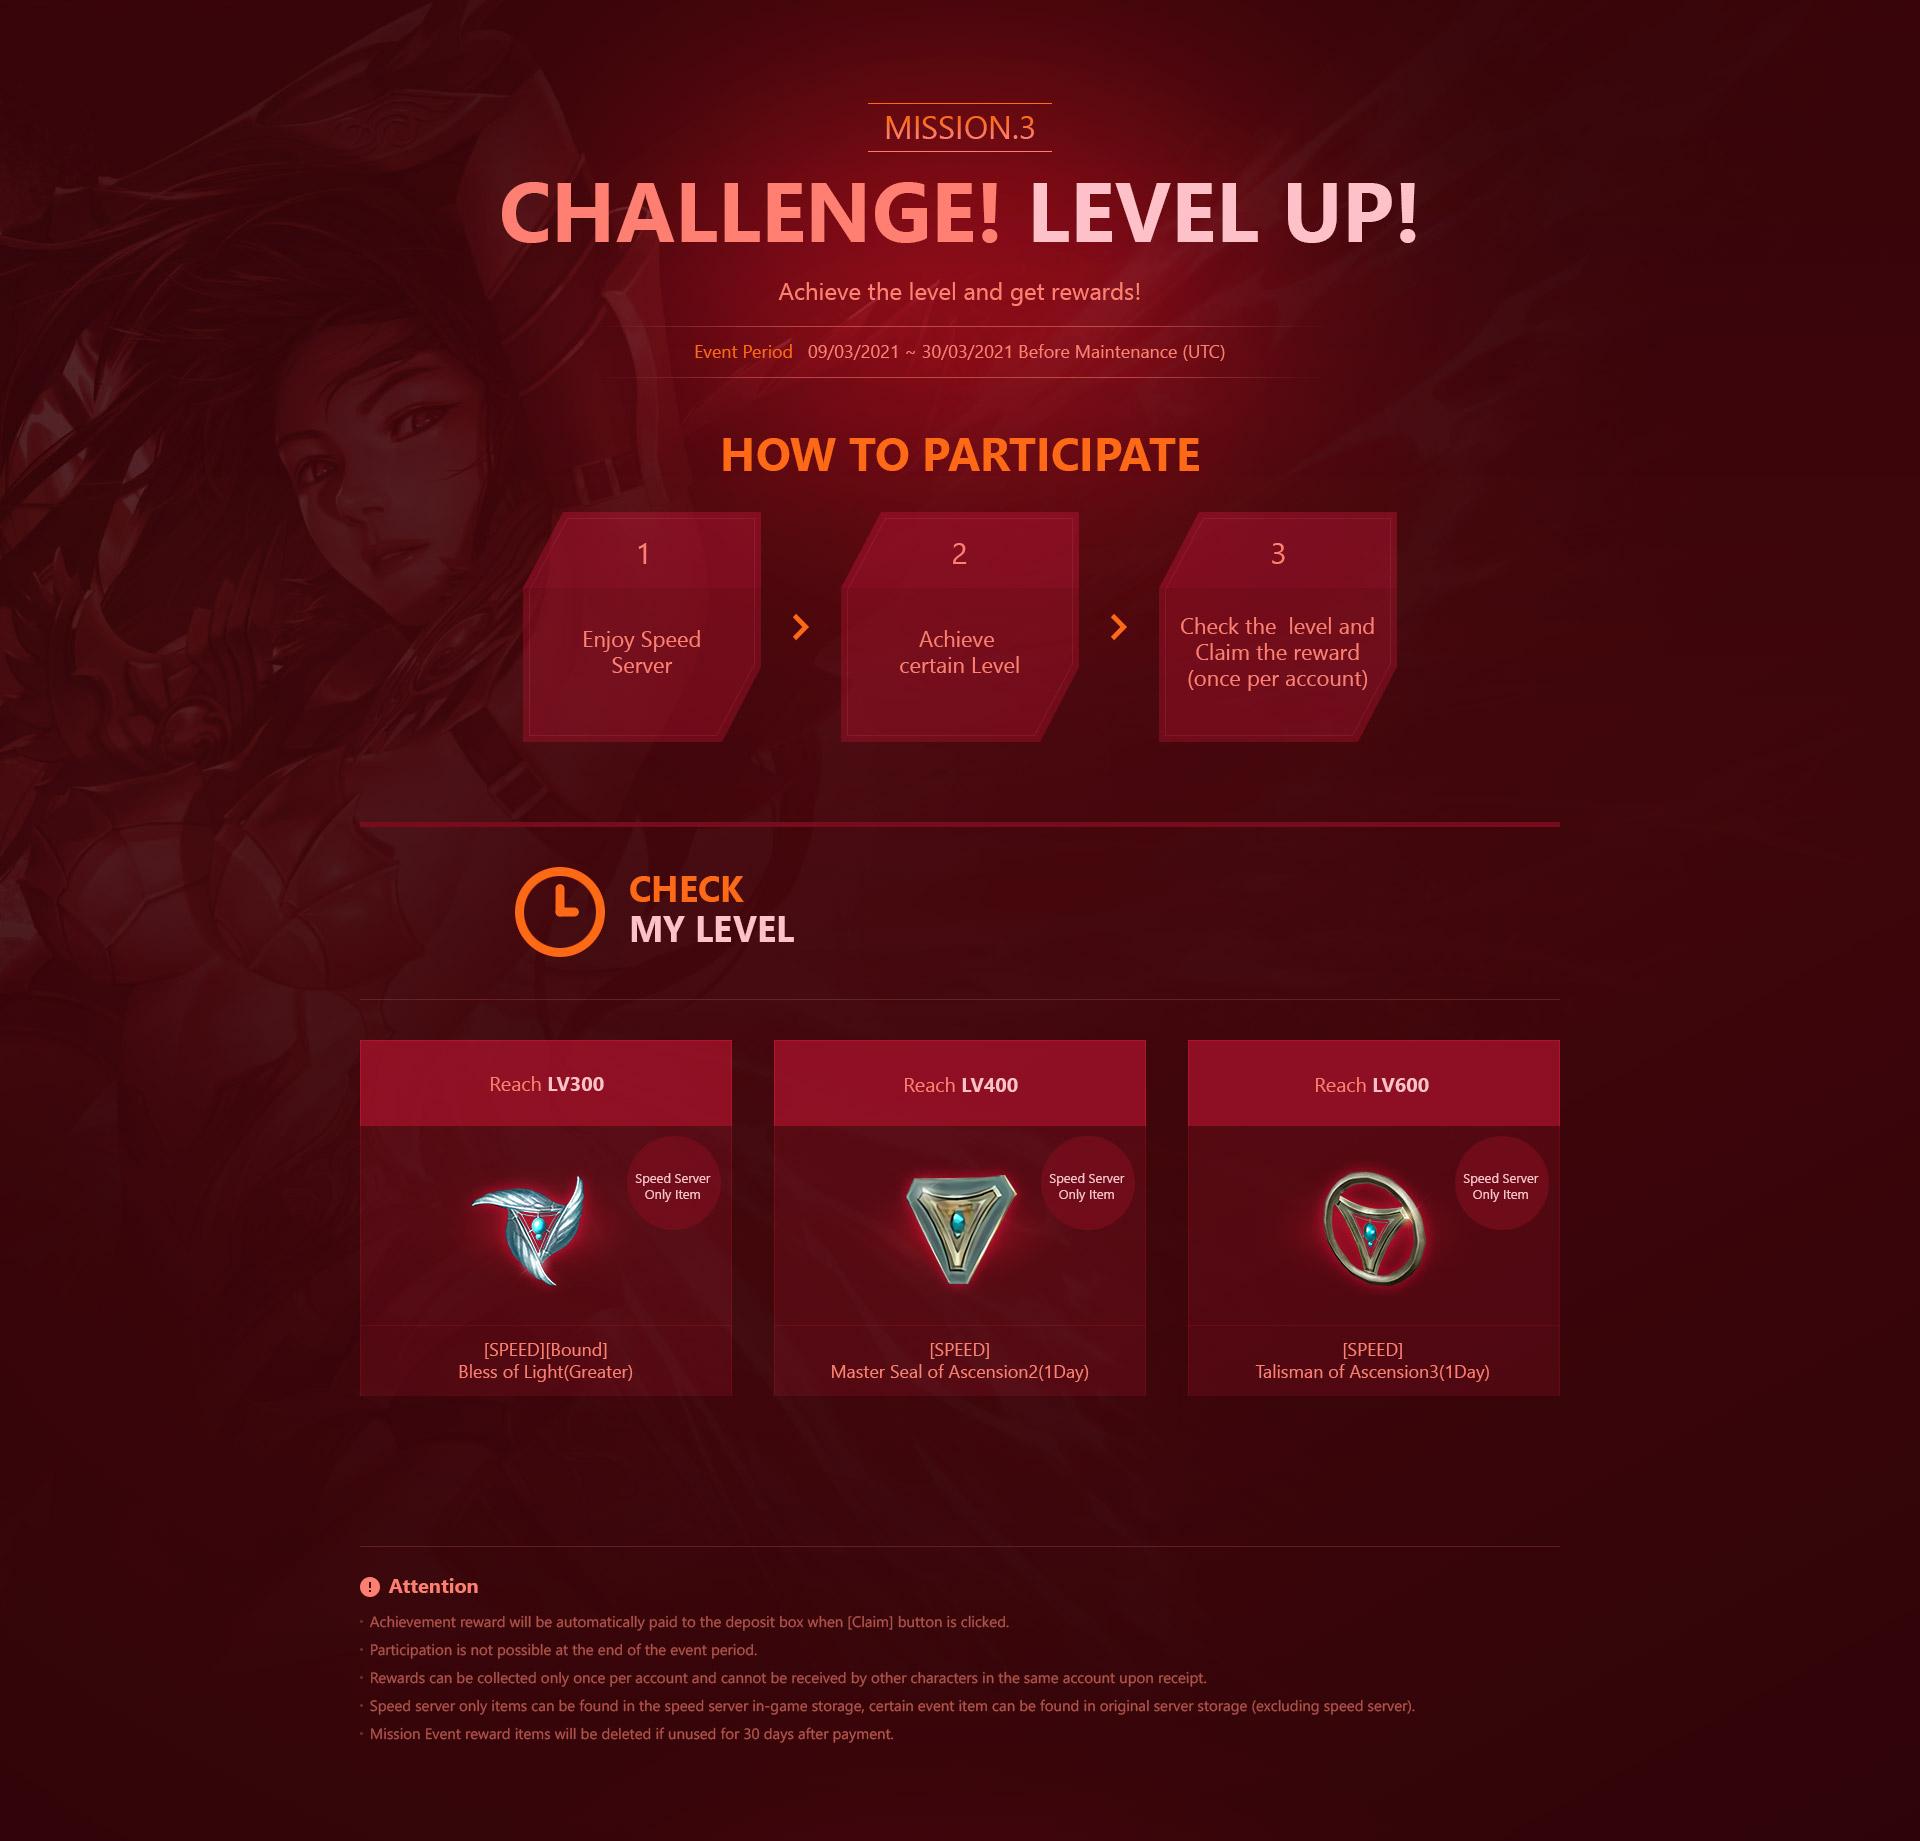 MISSION3 Challenge! Level UP!